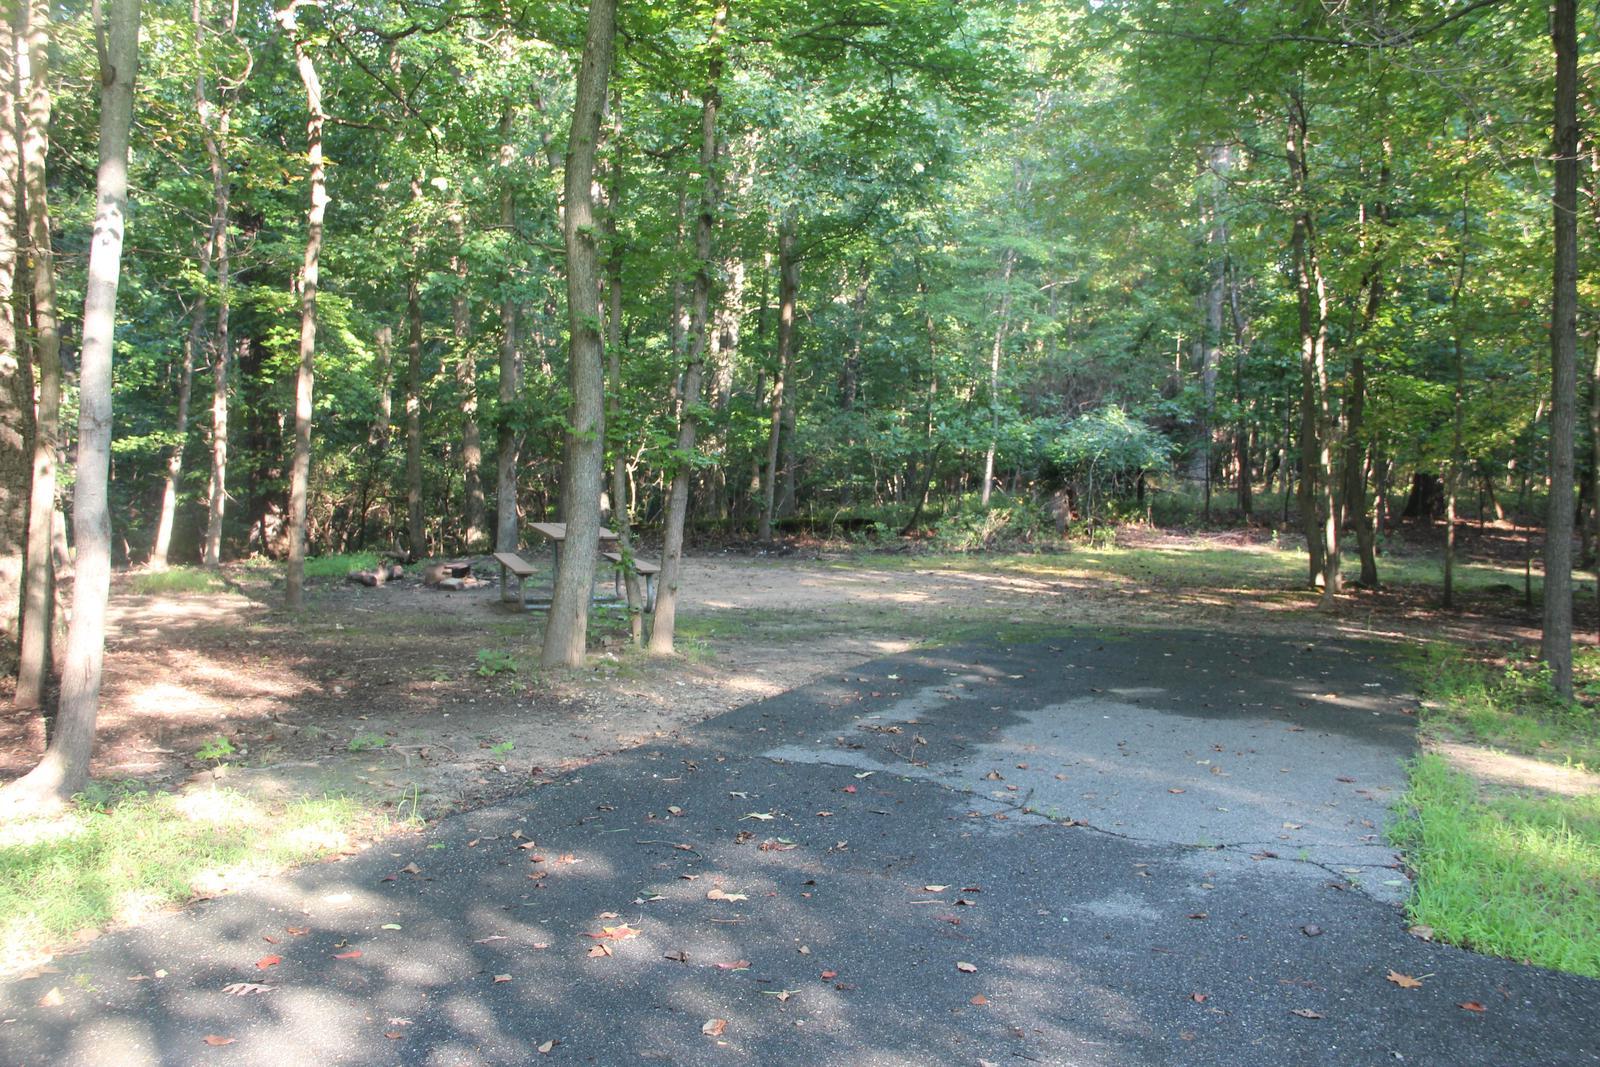 Greenbelt Park Campground C Loop Site 106